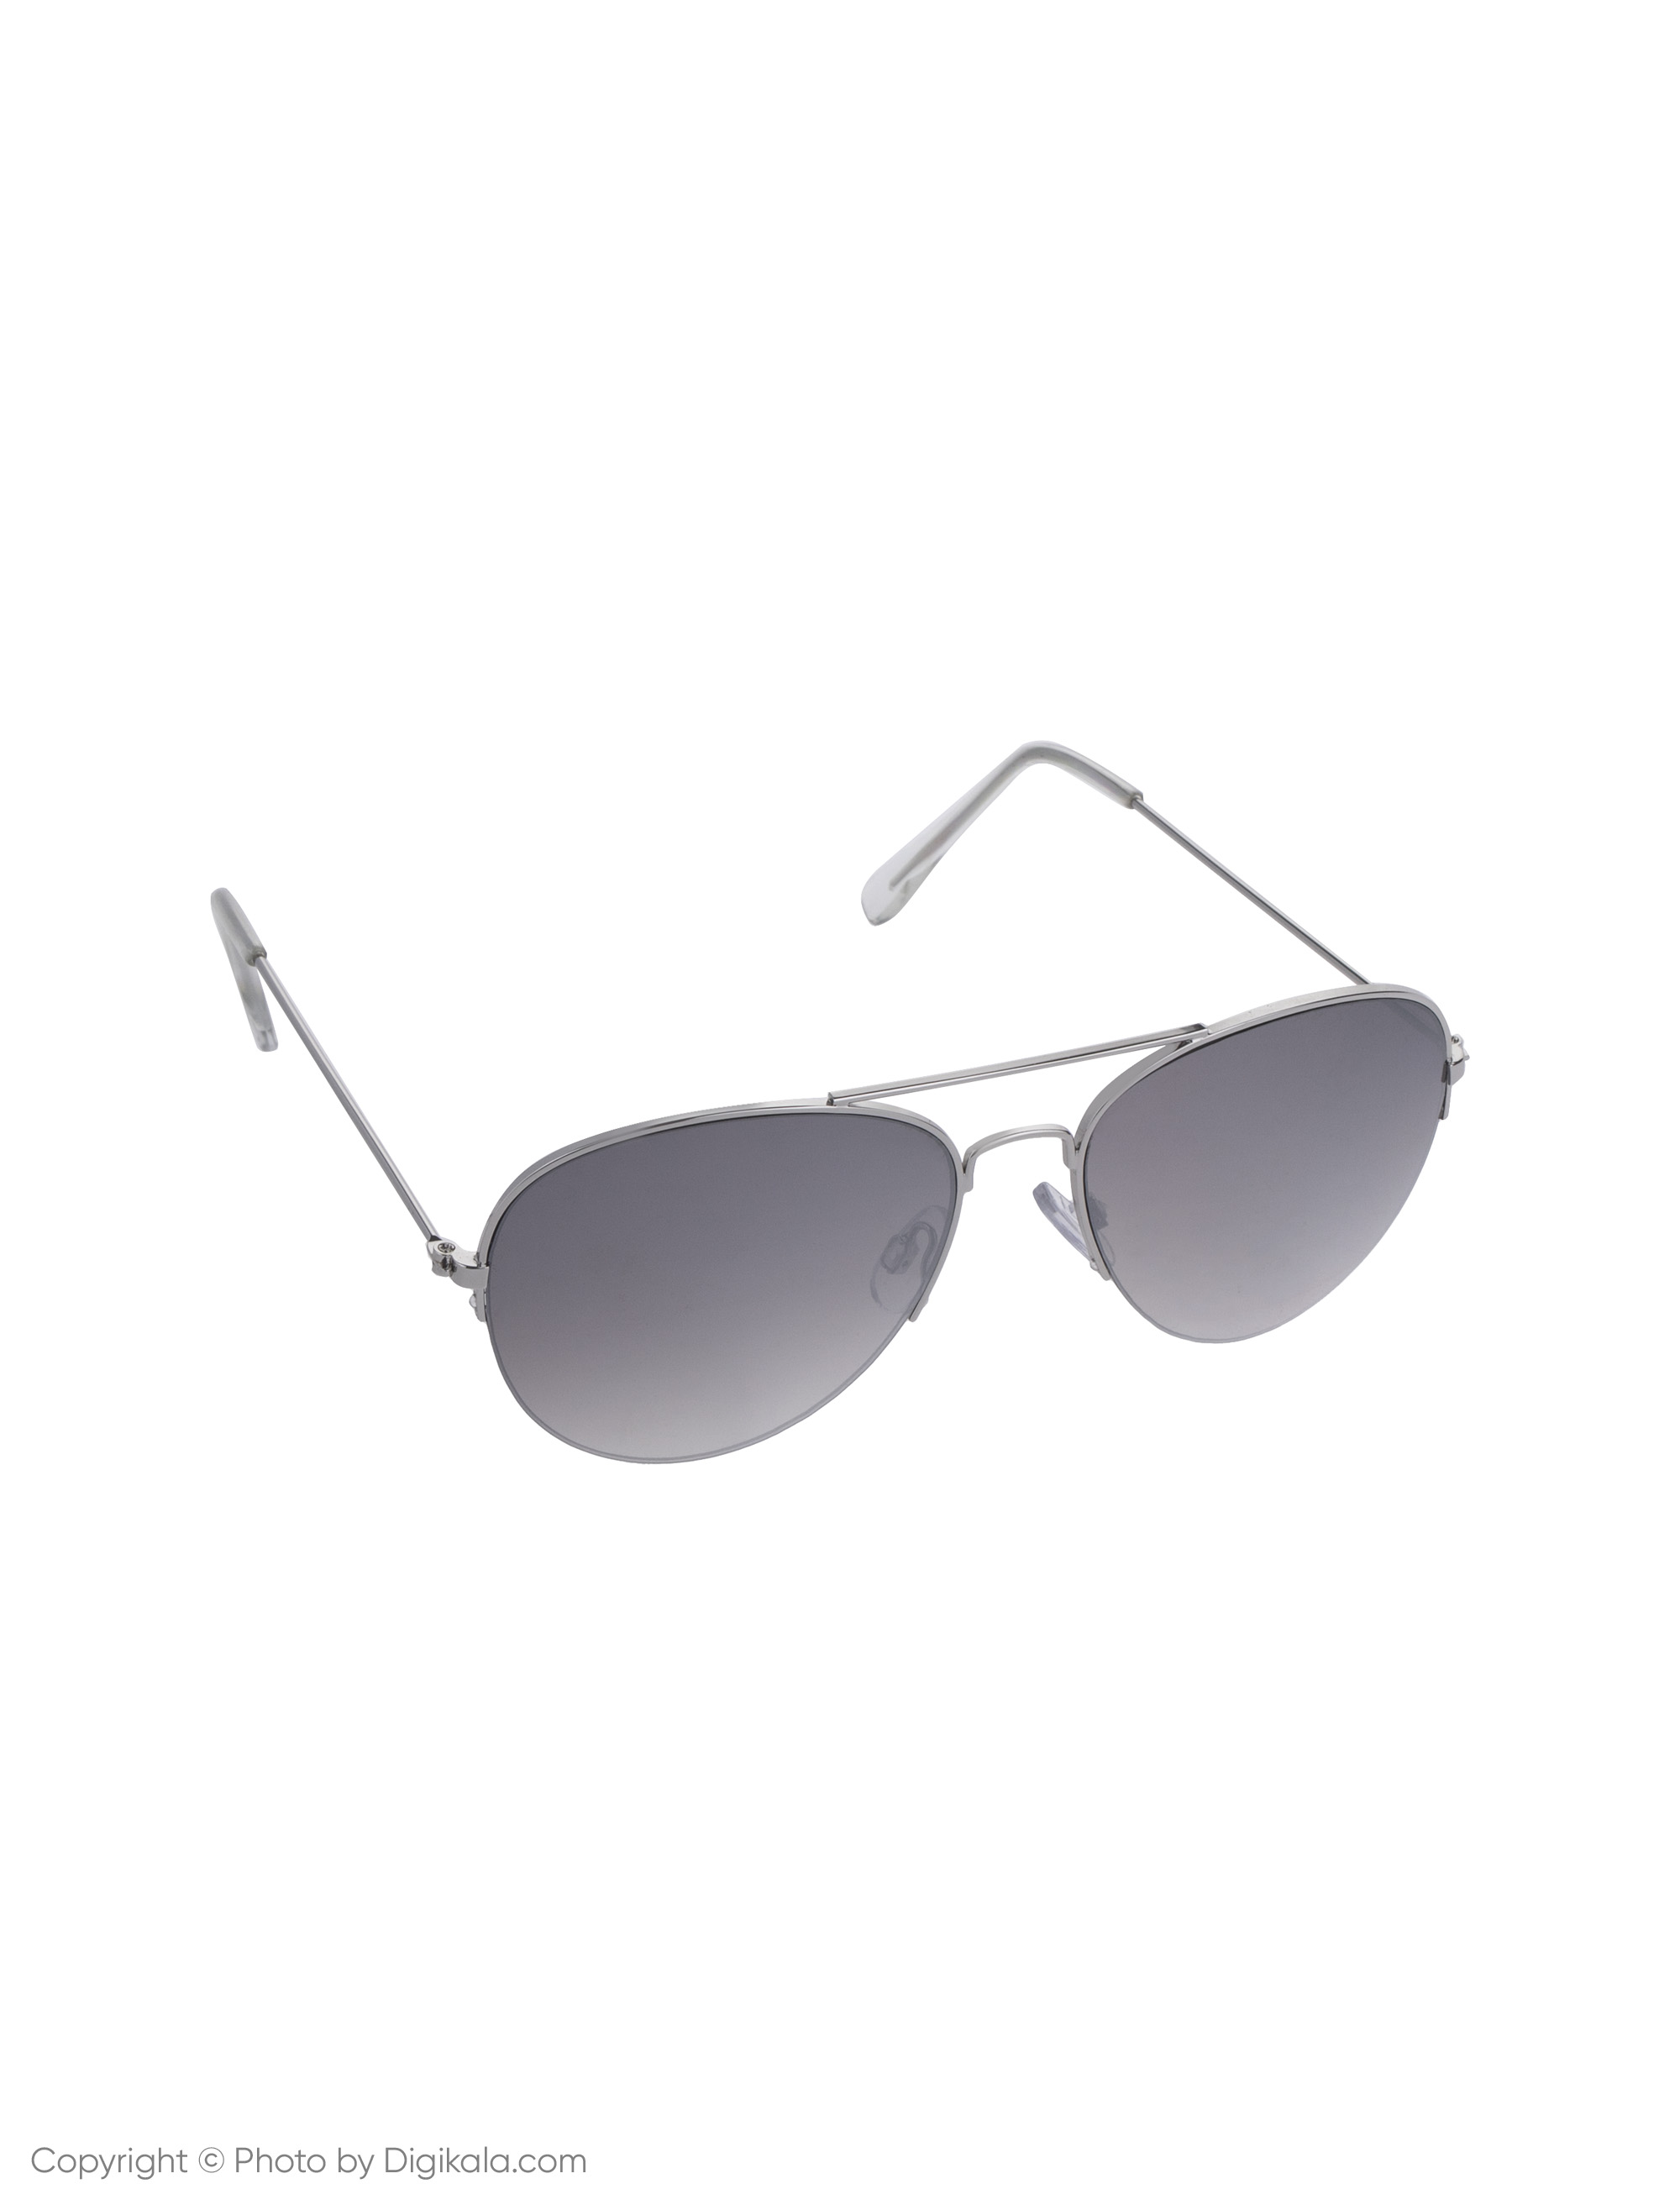 عینک آفتابی زنانه - پی سز